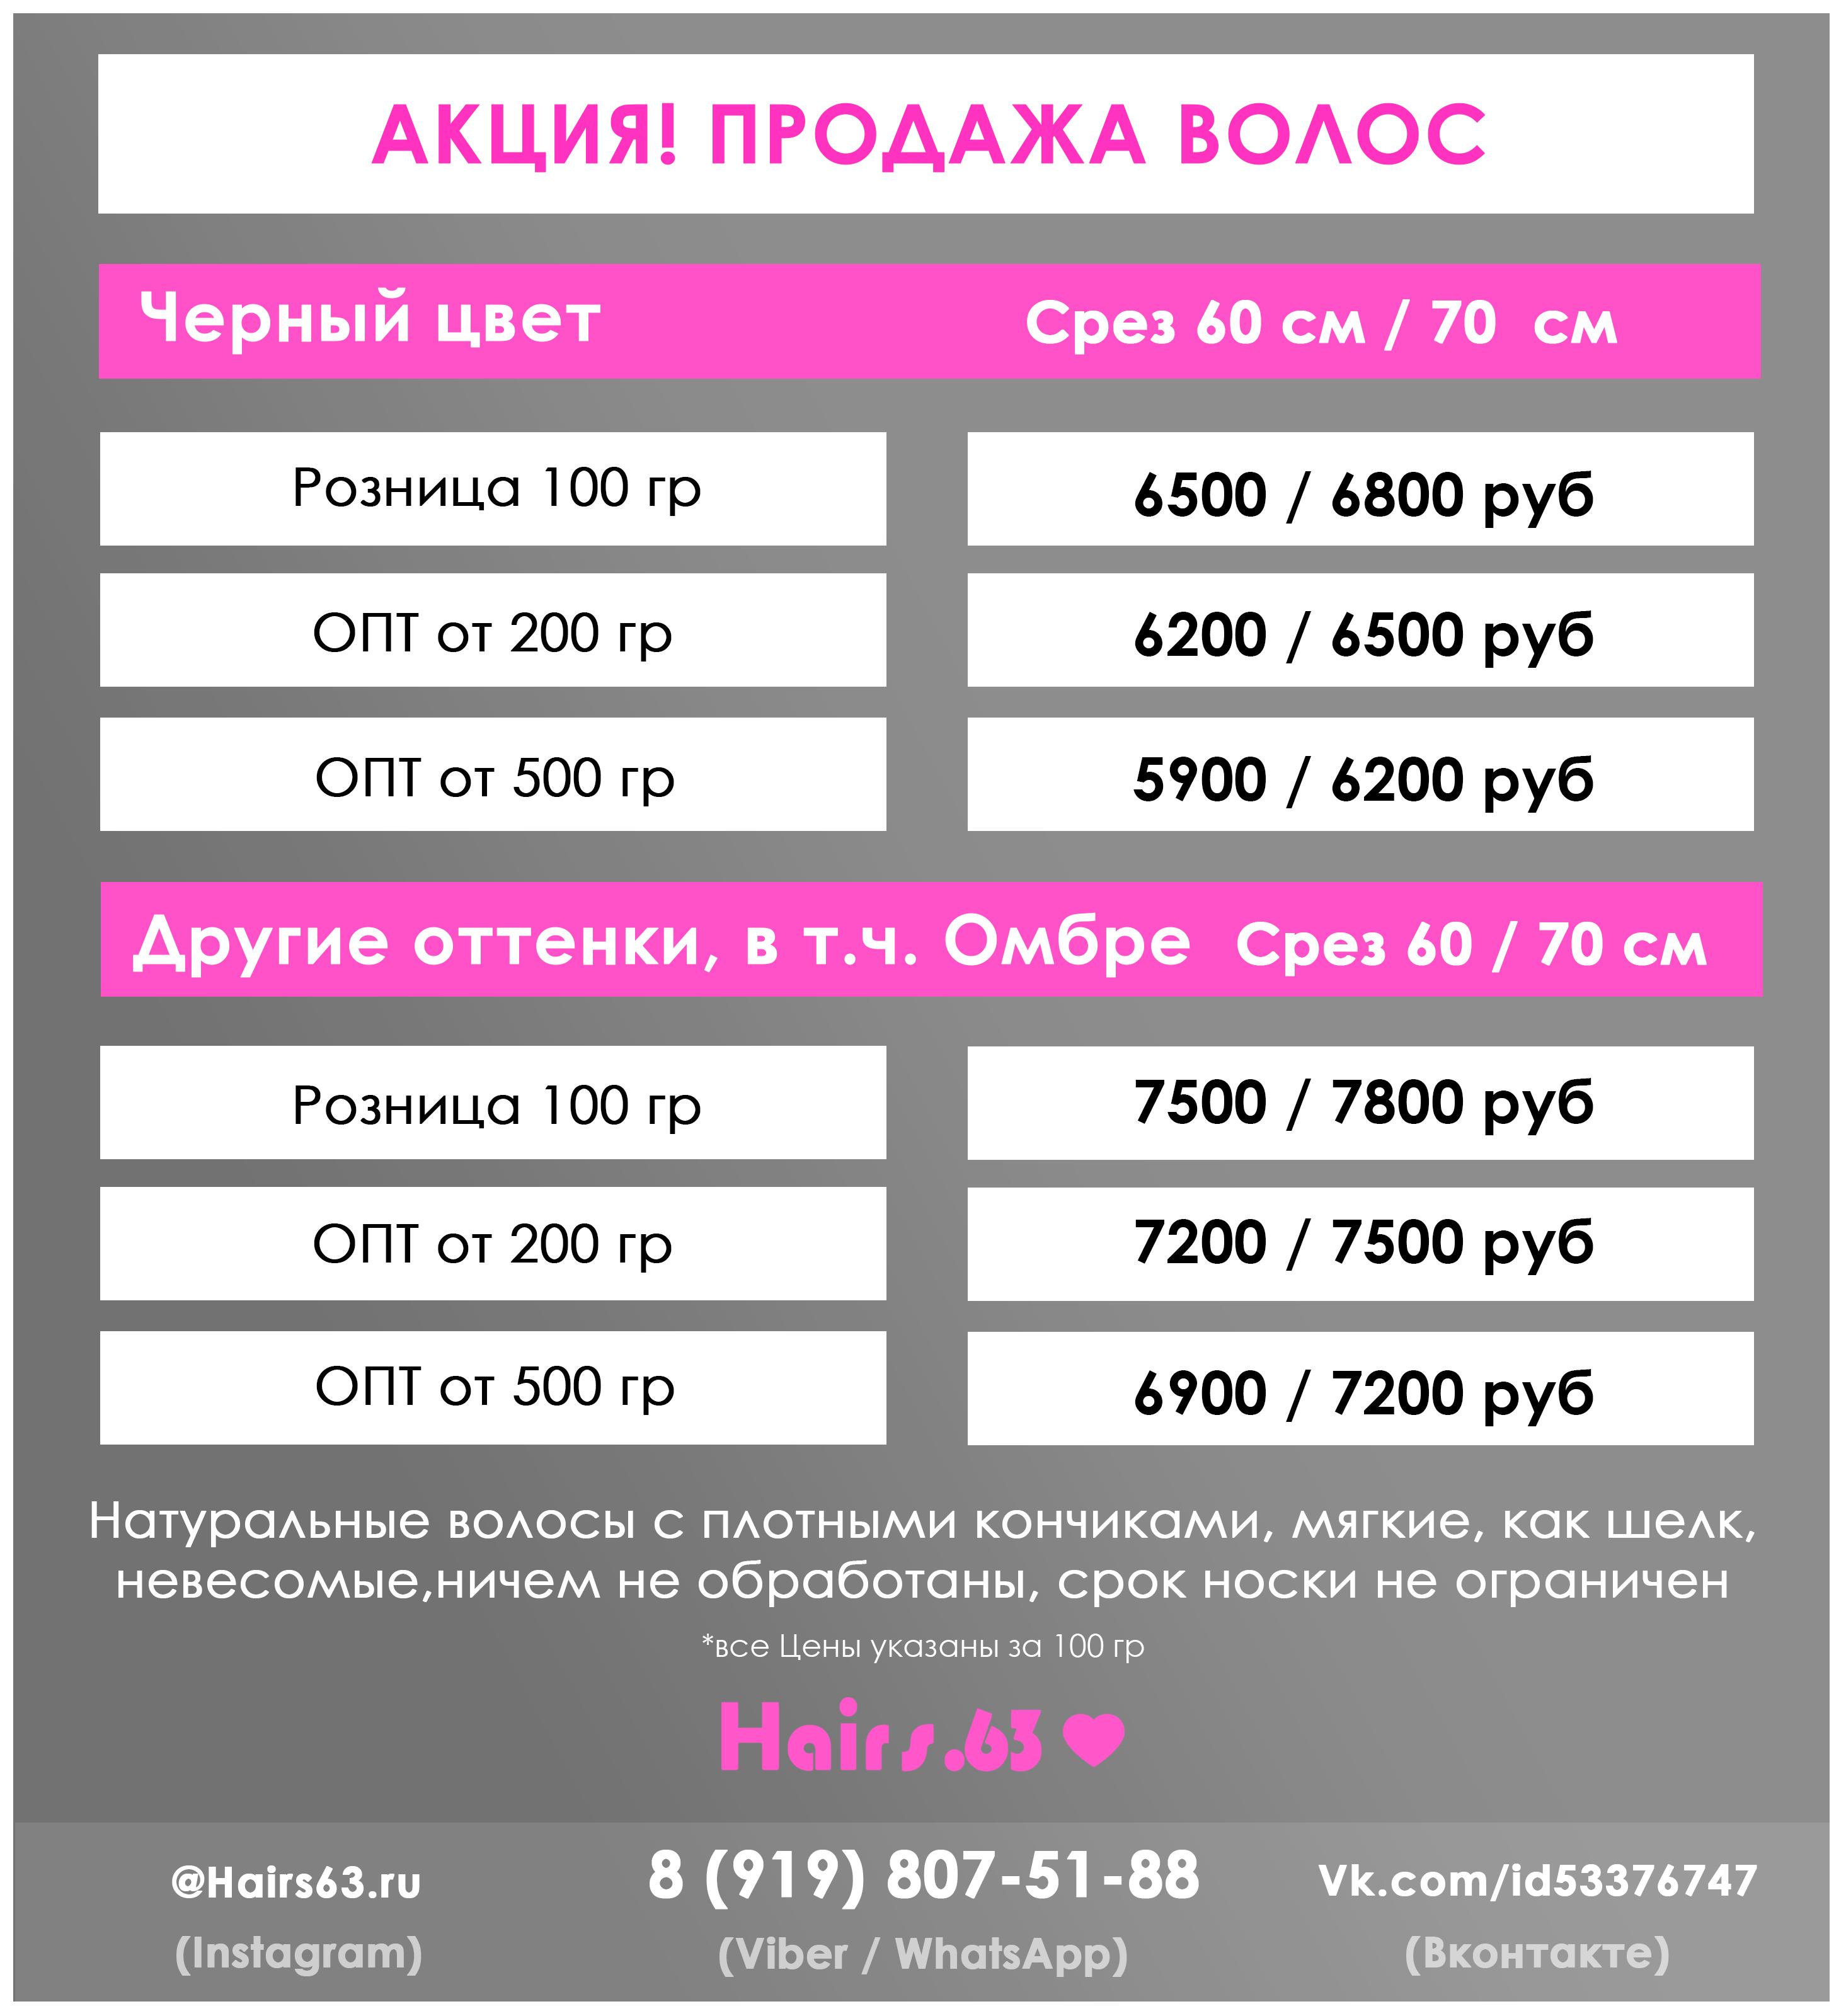 продажа волос в самаре 060519